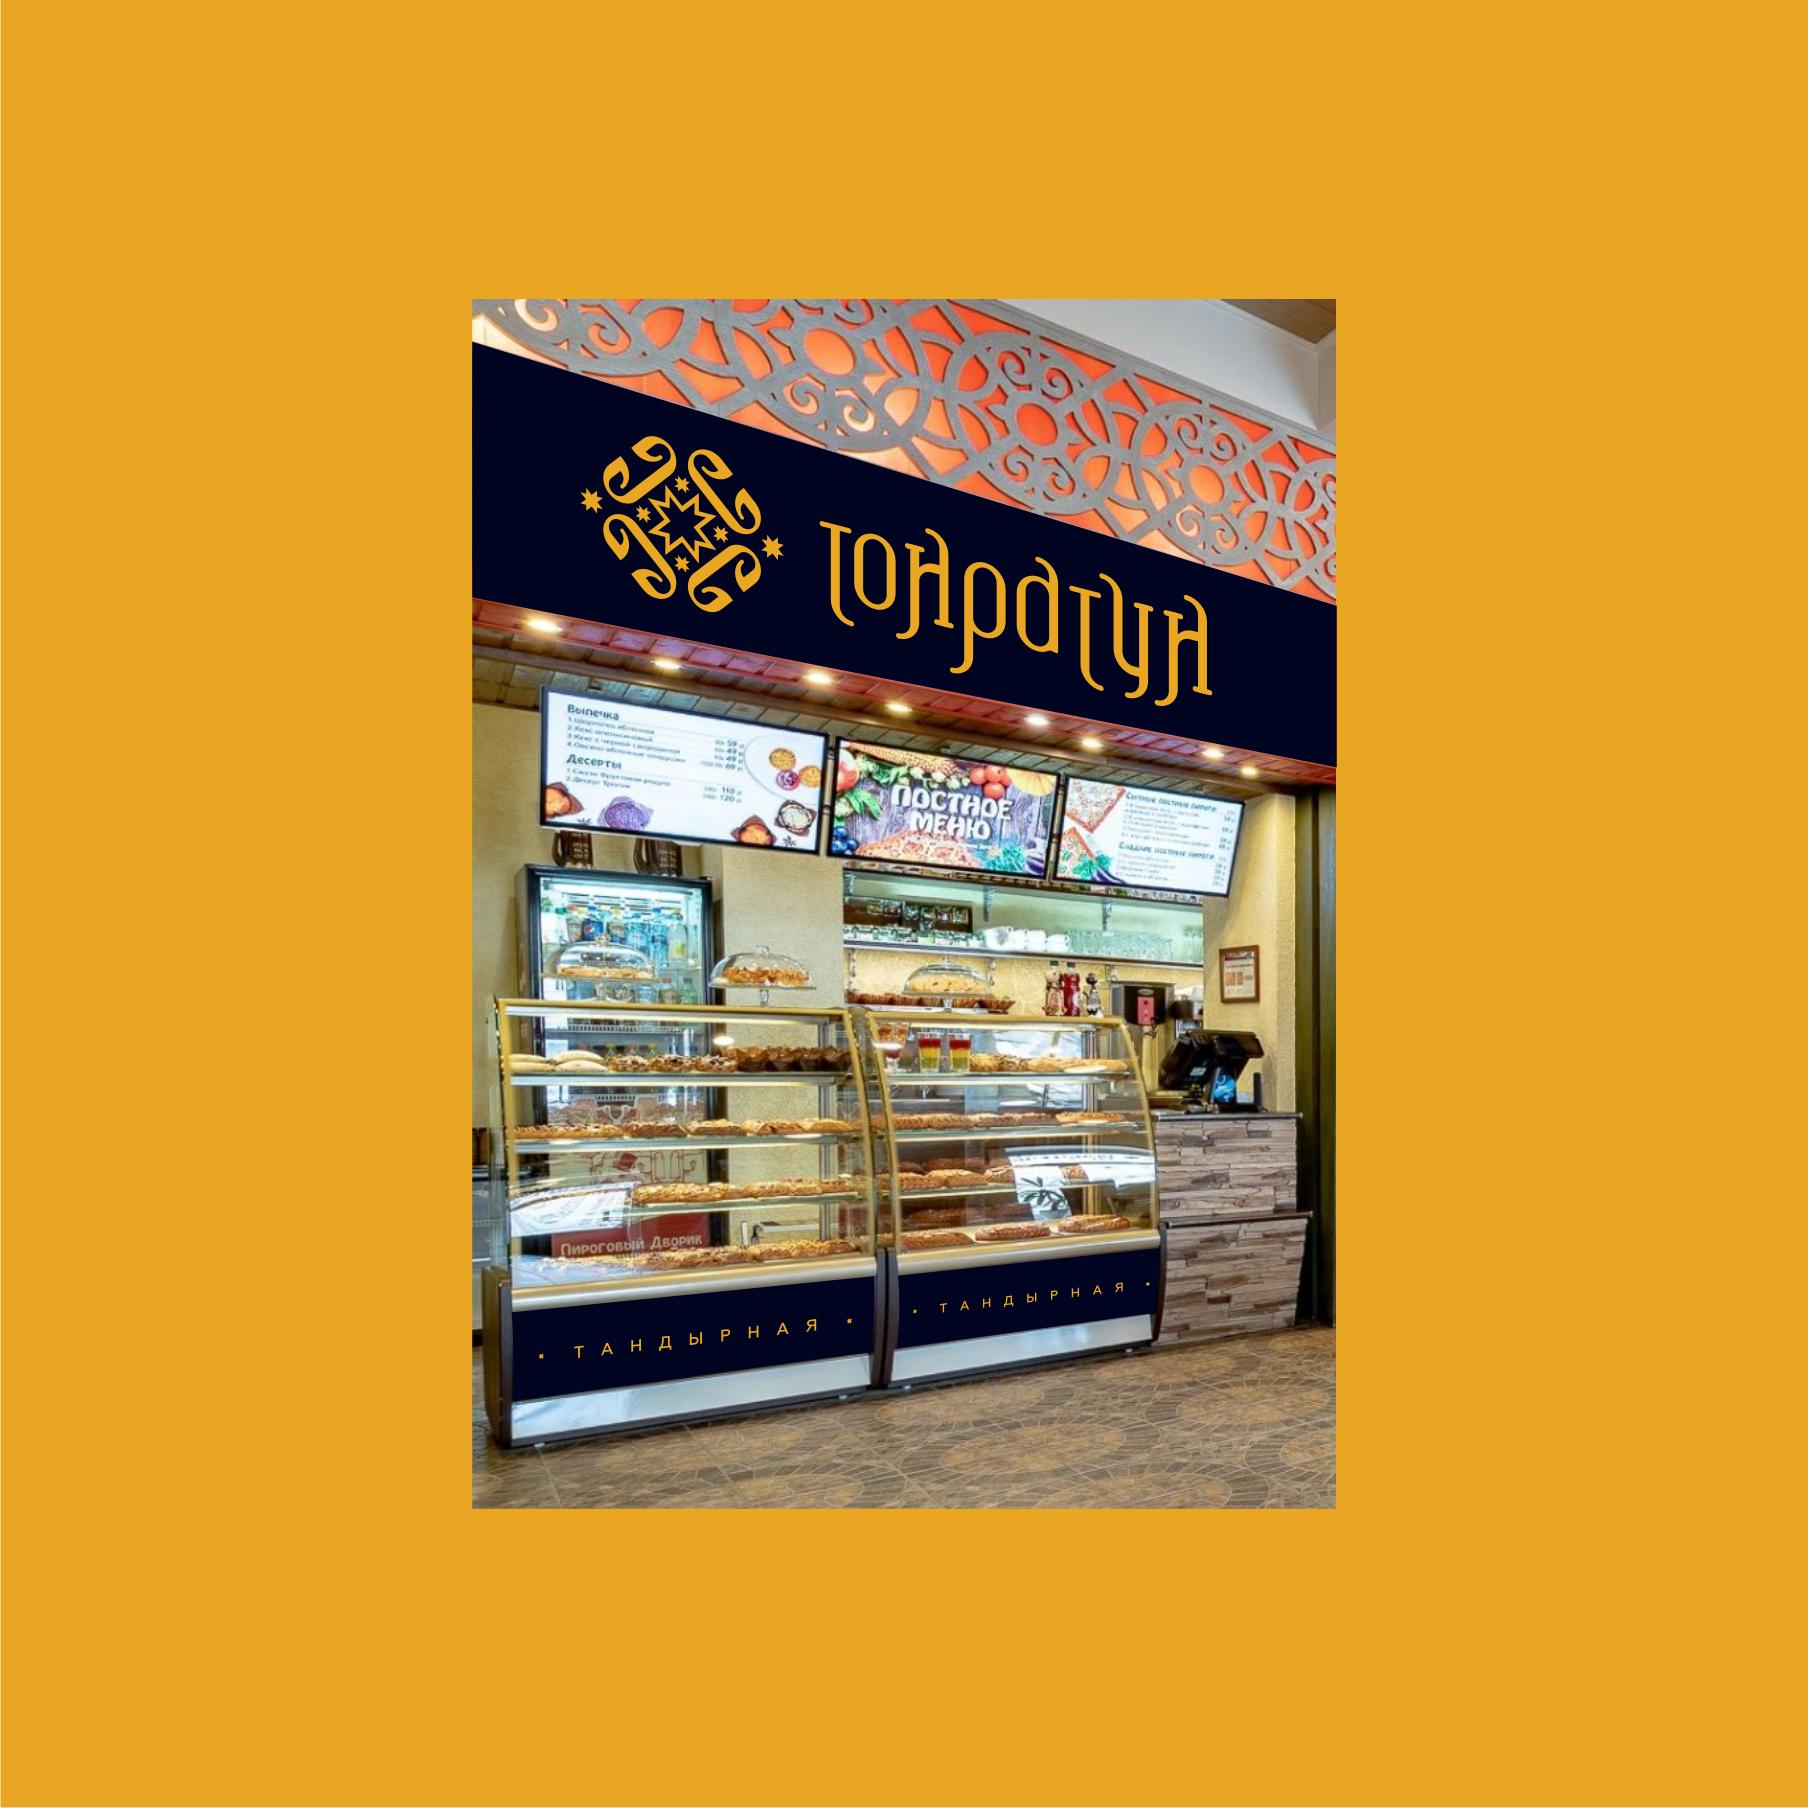 Логотип для Пекарни-Тандырной  фото f_2935d92598279dfb.png